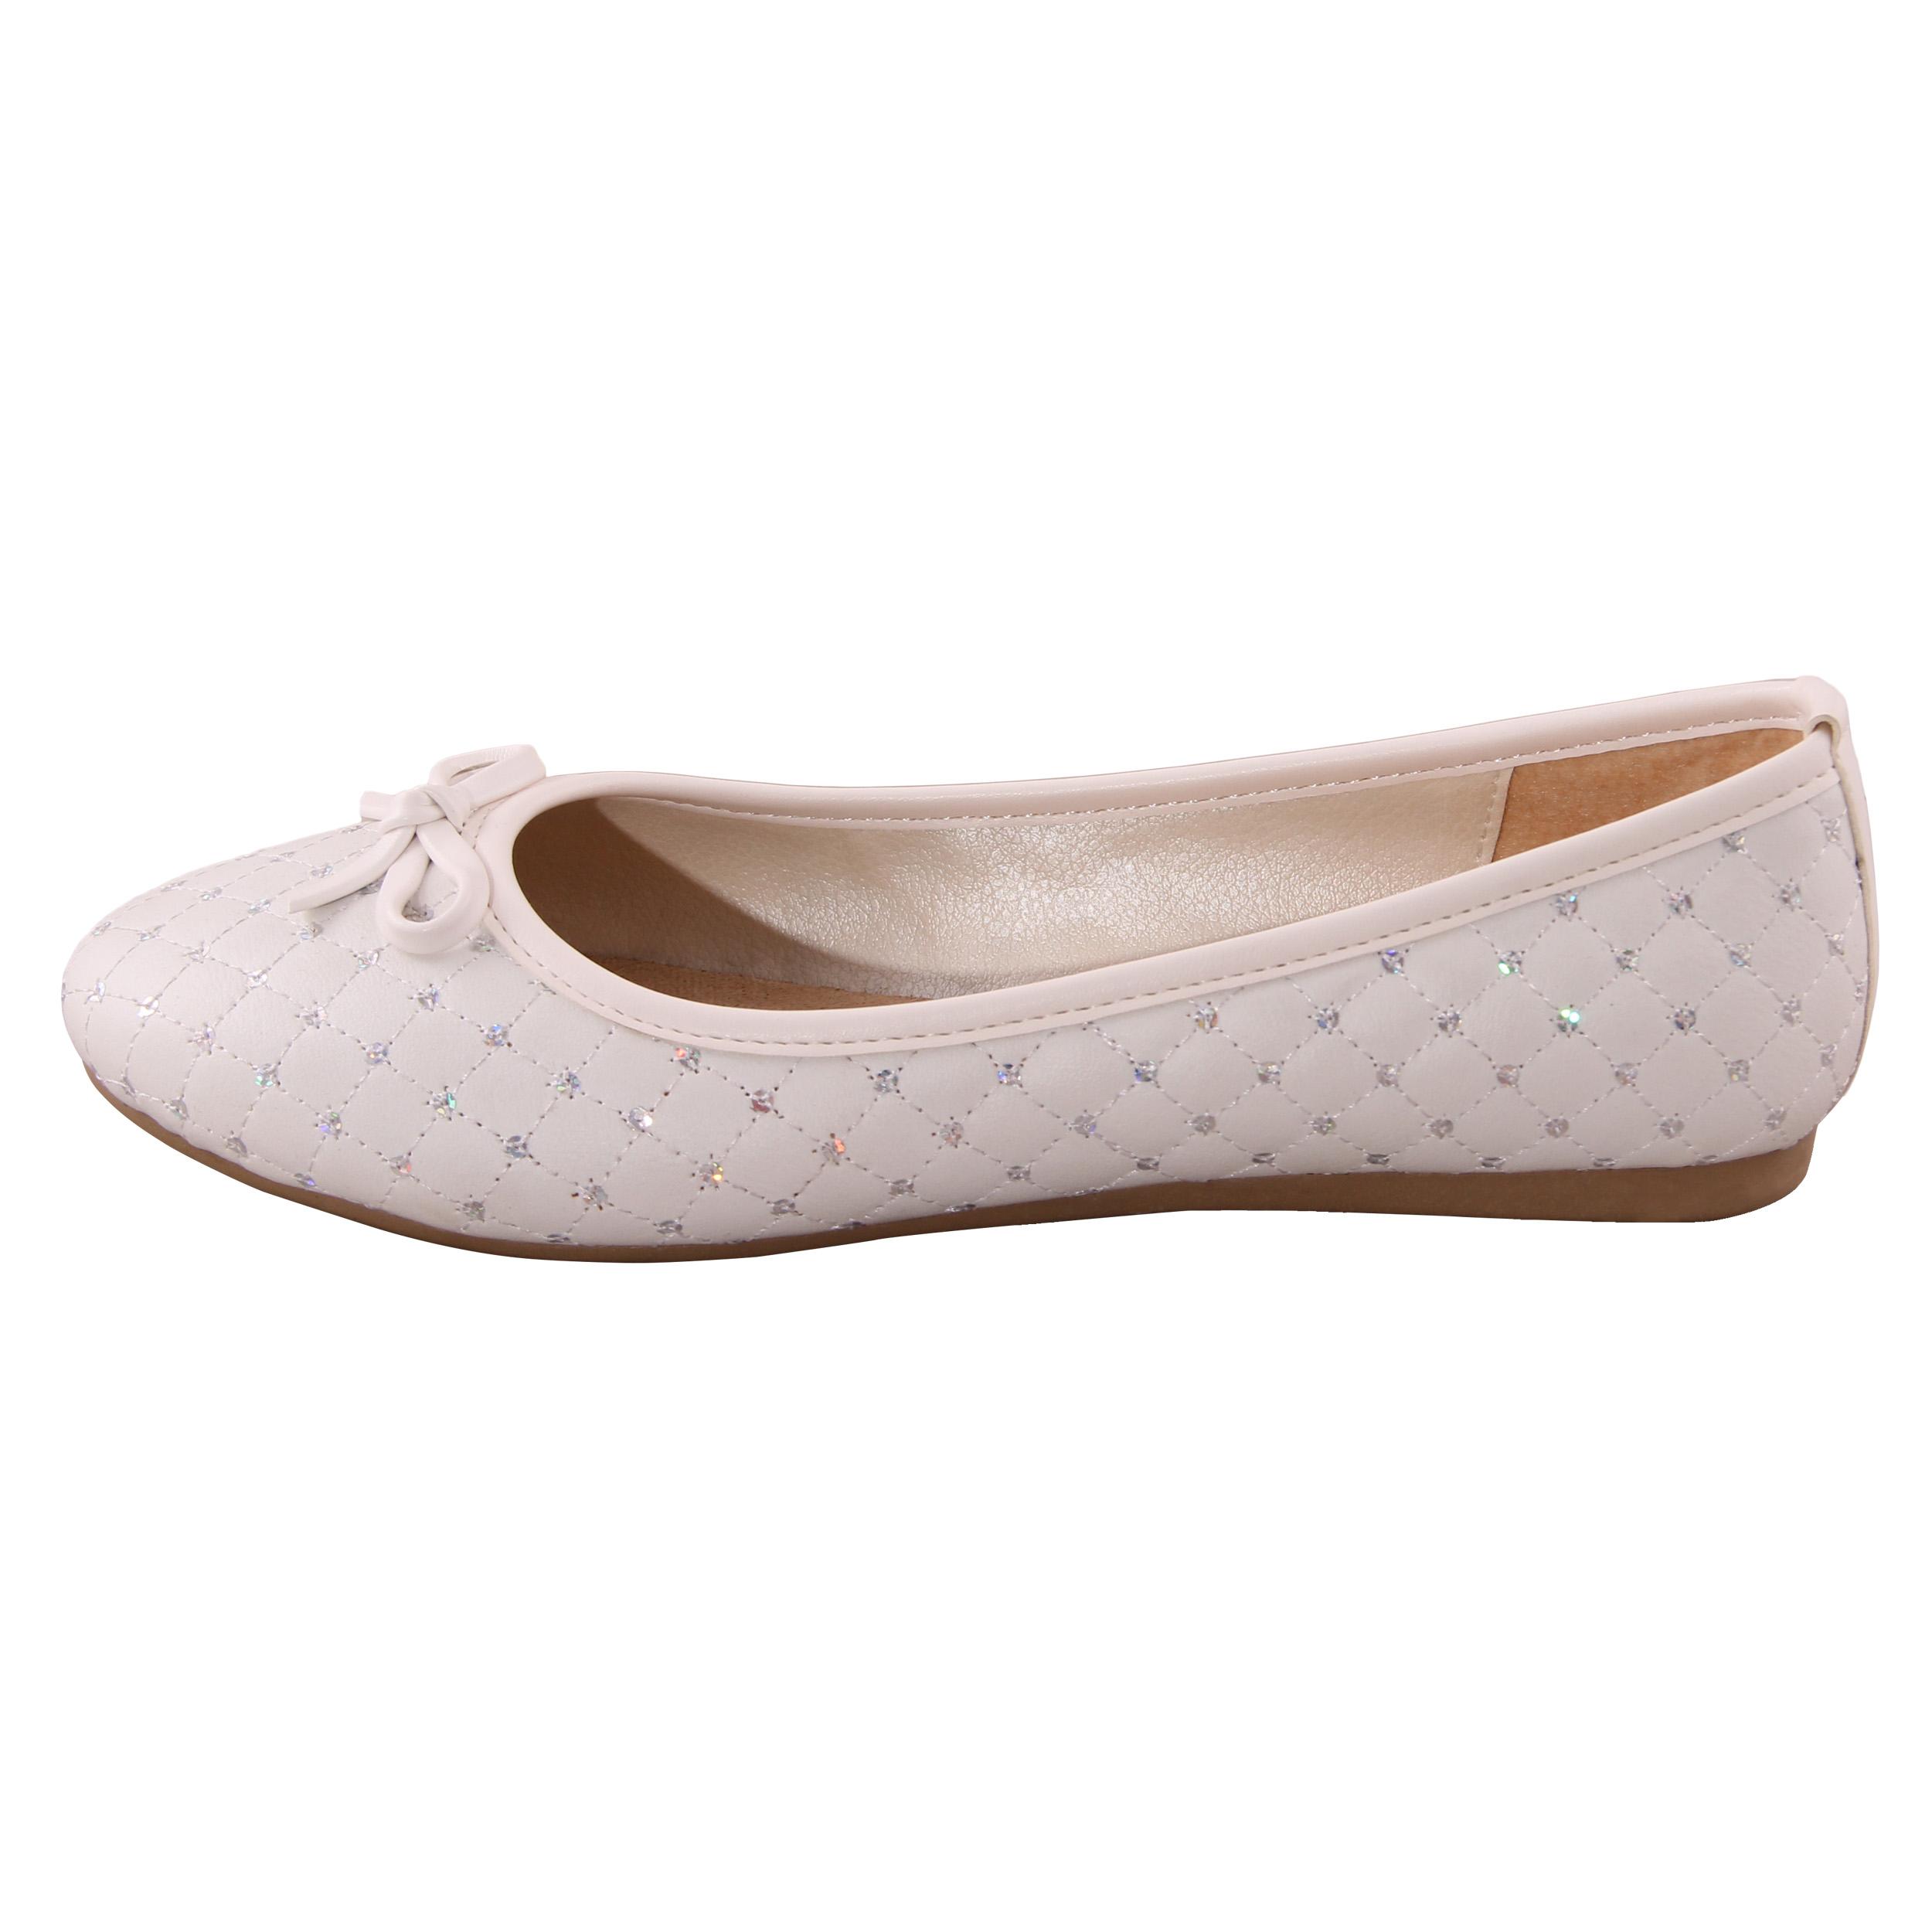 کفش زنانه کد 4-39940